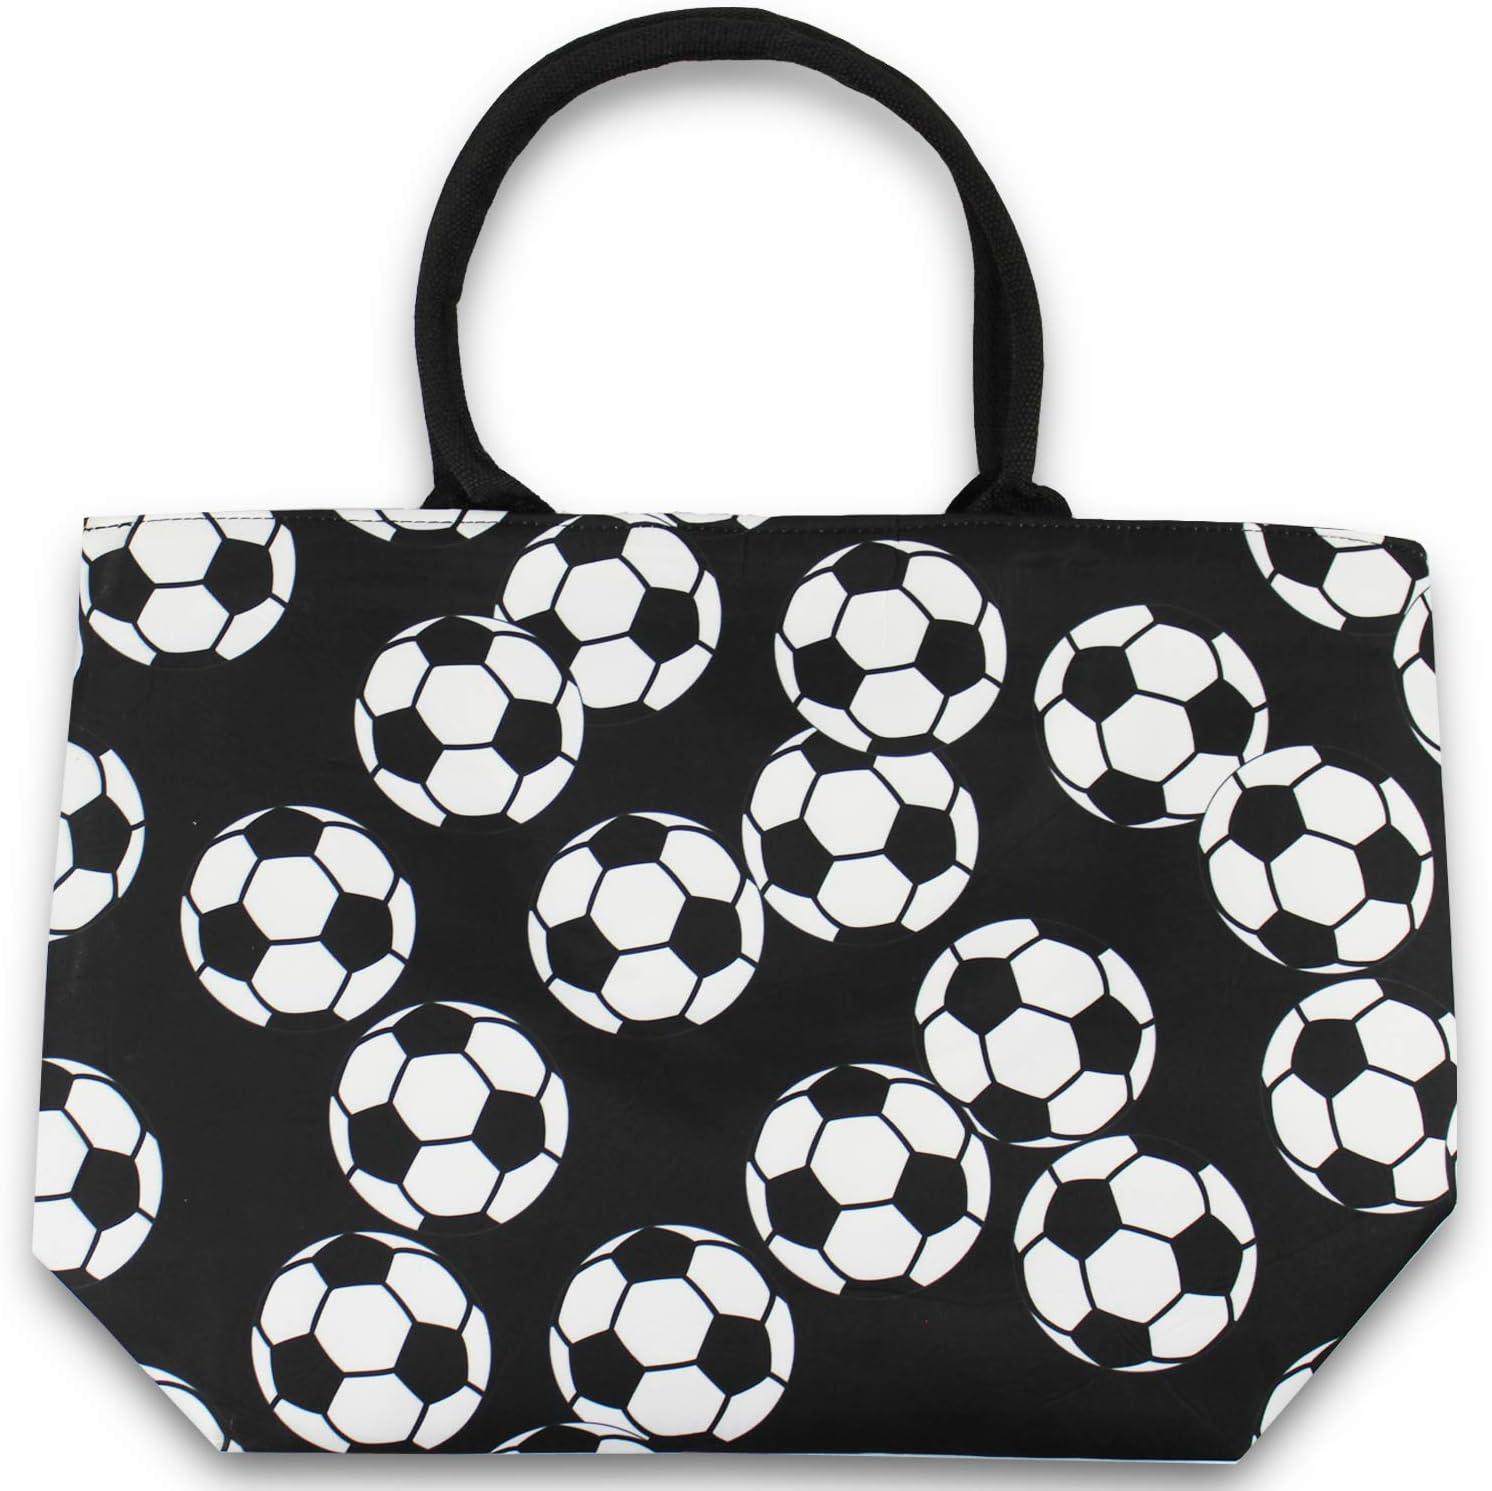 Soccer Urbanifi Sports Prints Utility Canvas Tote Bag Handbag Medium Mom